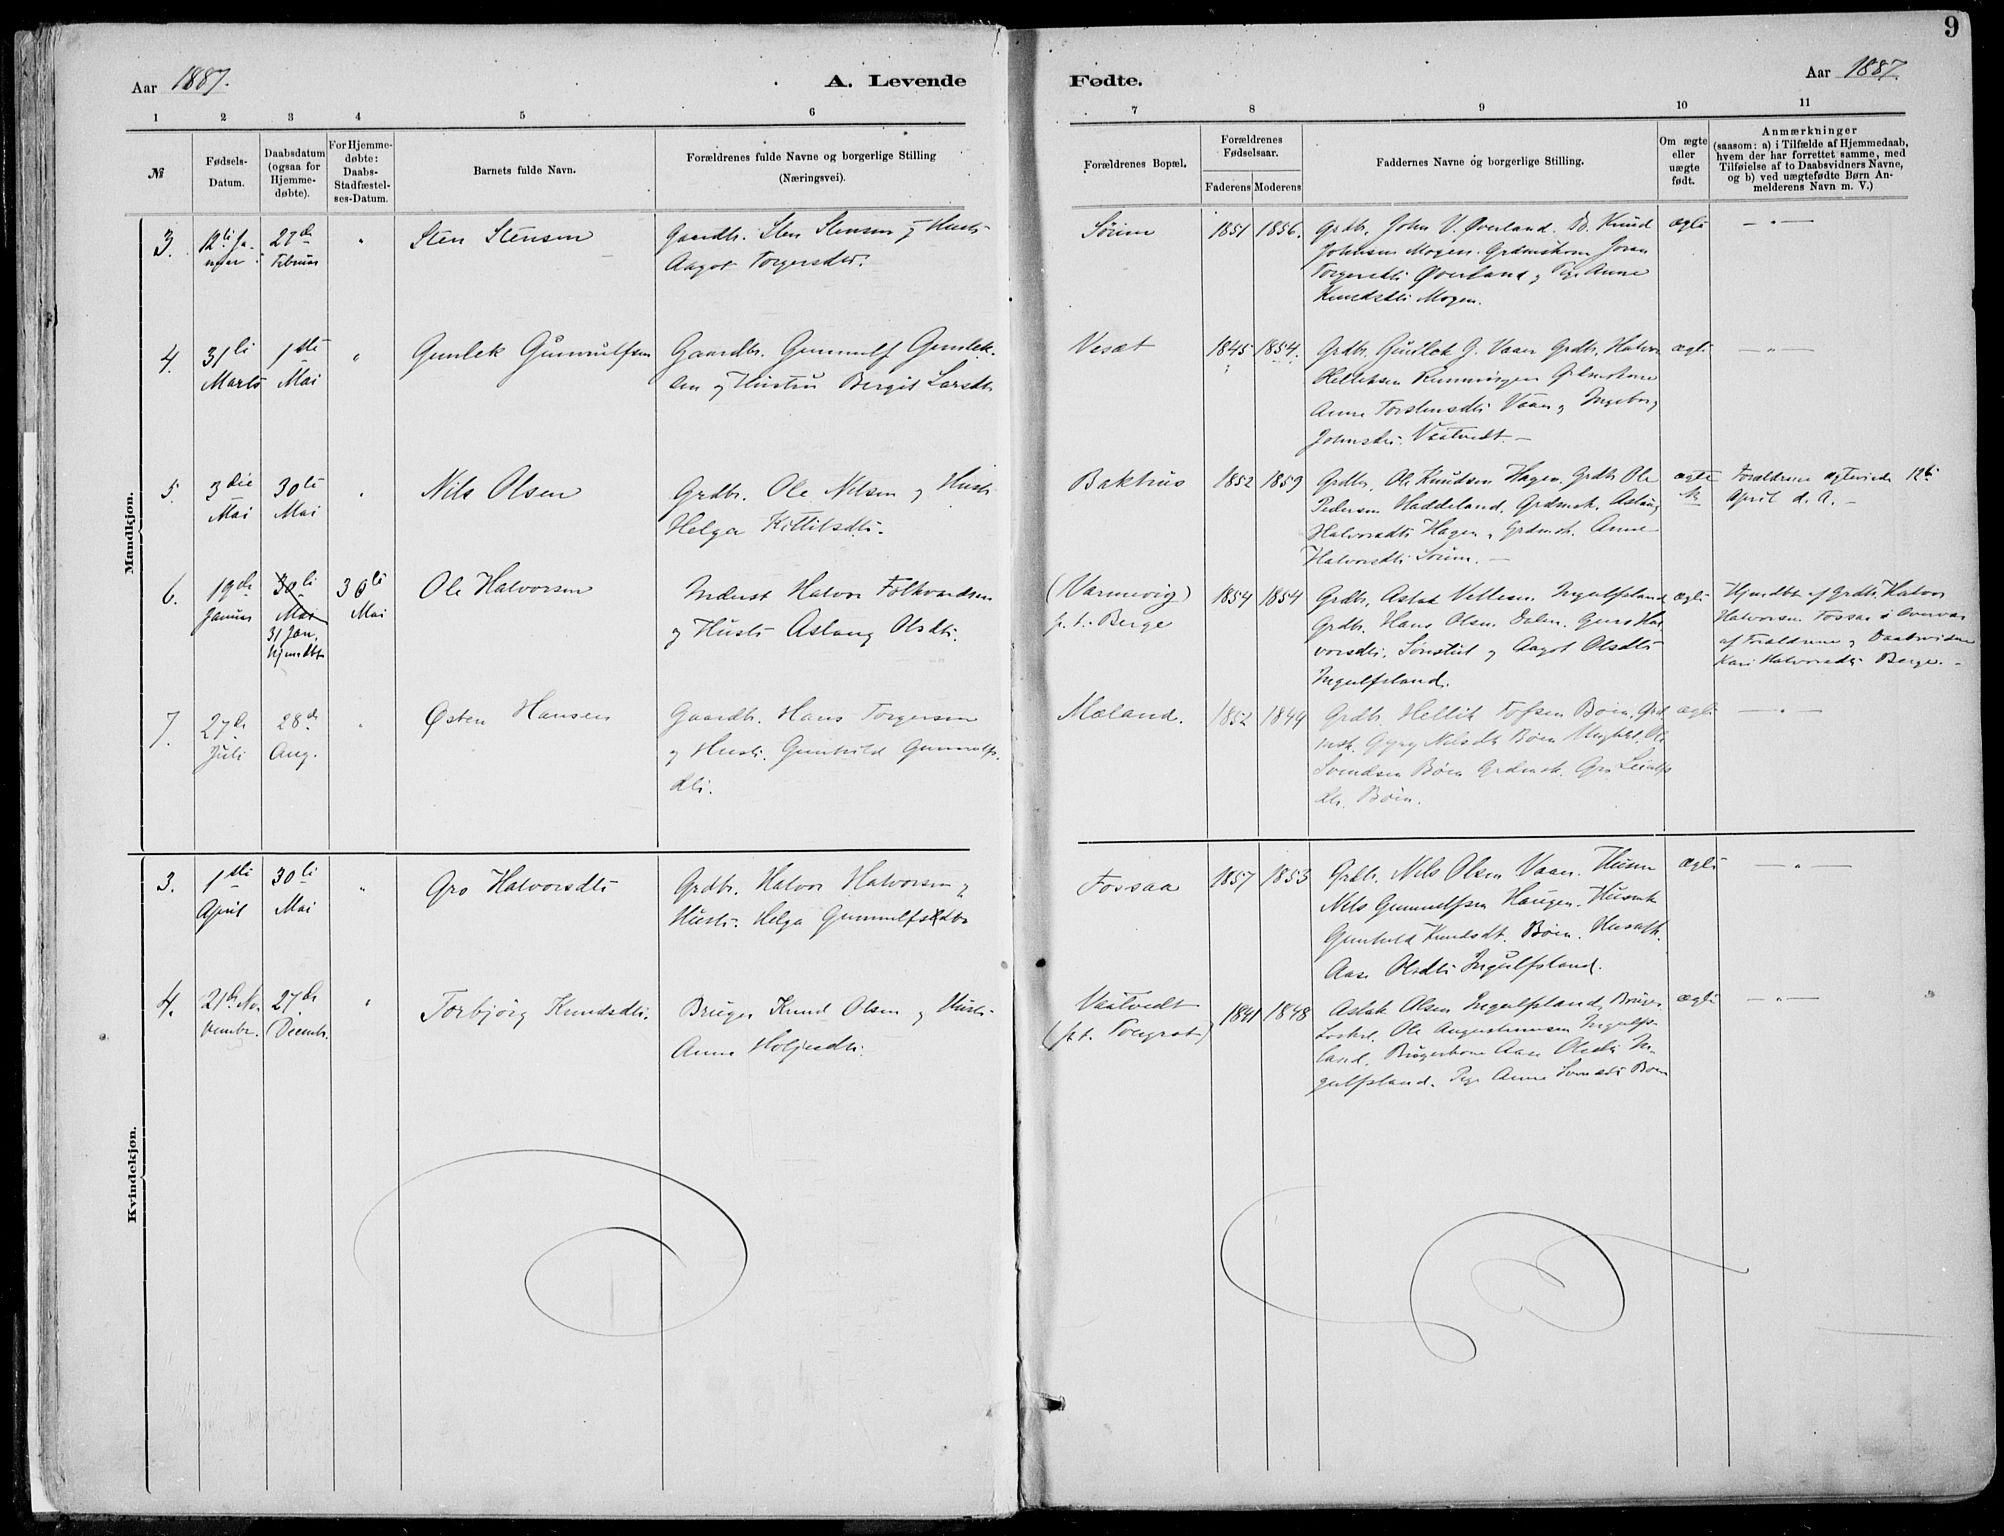 SAKO, Rjukan kirkebøker, F/Fa/L0001: Ministerialbok nr. 1, 1878-1912, s. 9